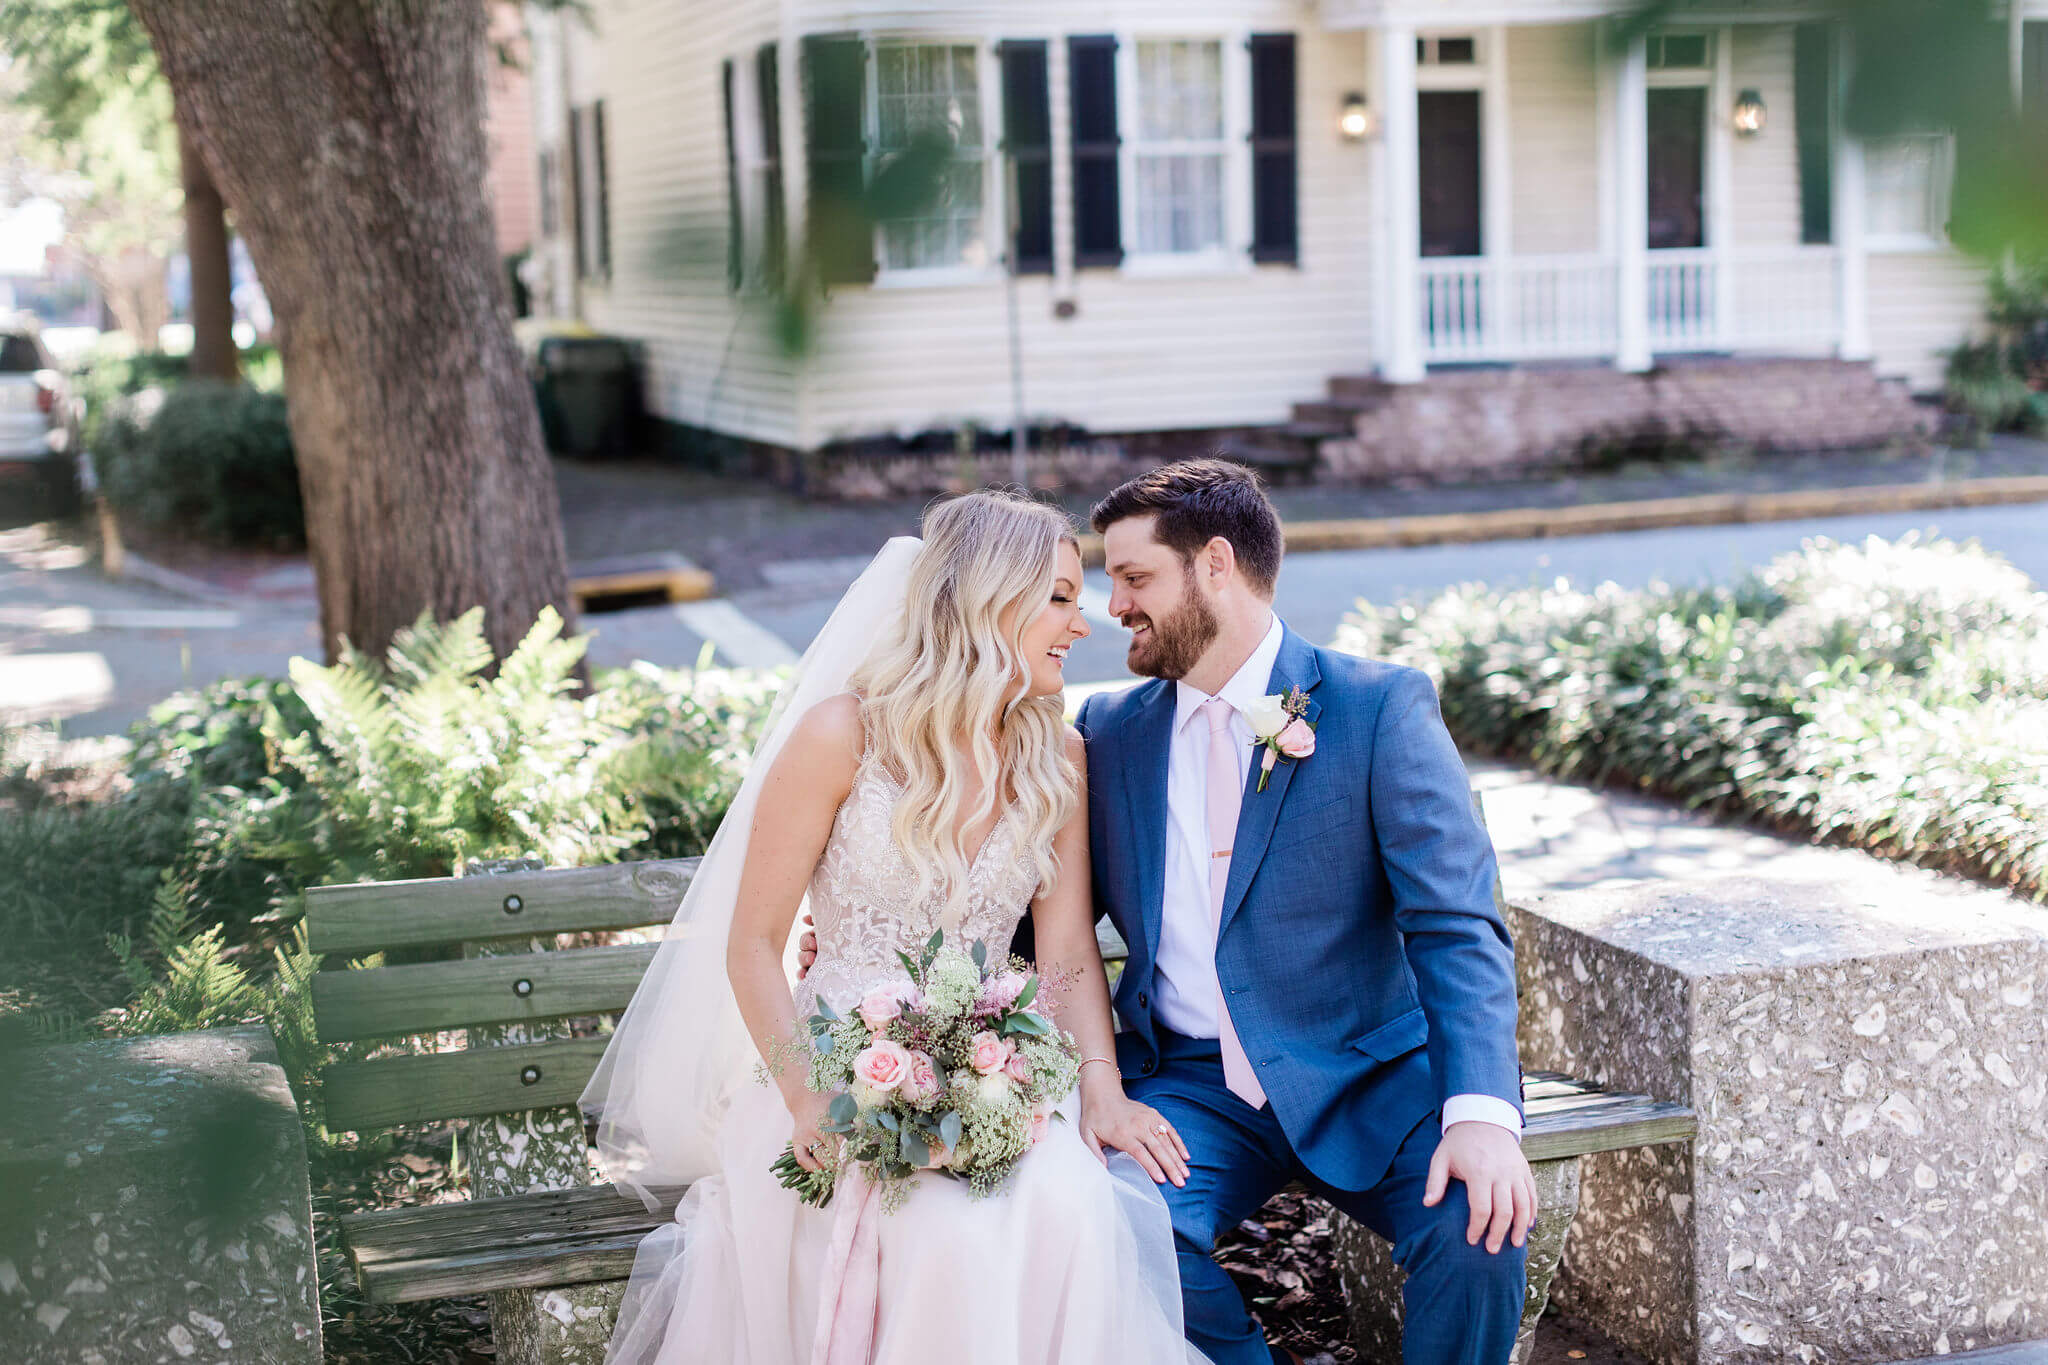 apt-b-photography-savannah-wedding-photographer-savannah-wedding-savannah-elopement-intimate-wedding-photographer-2.jpg